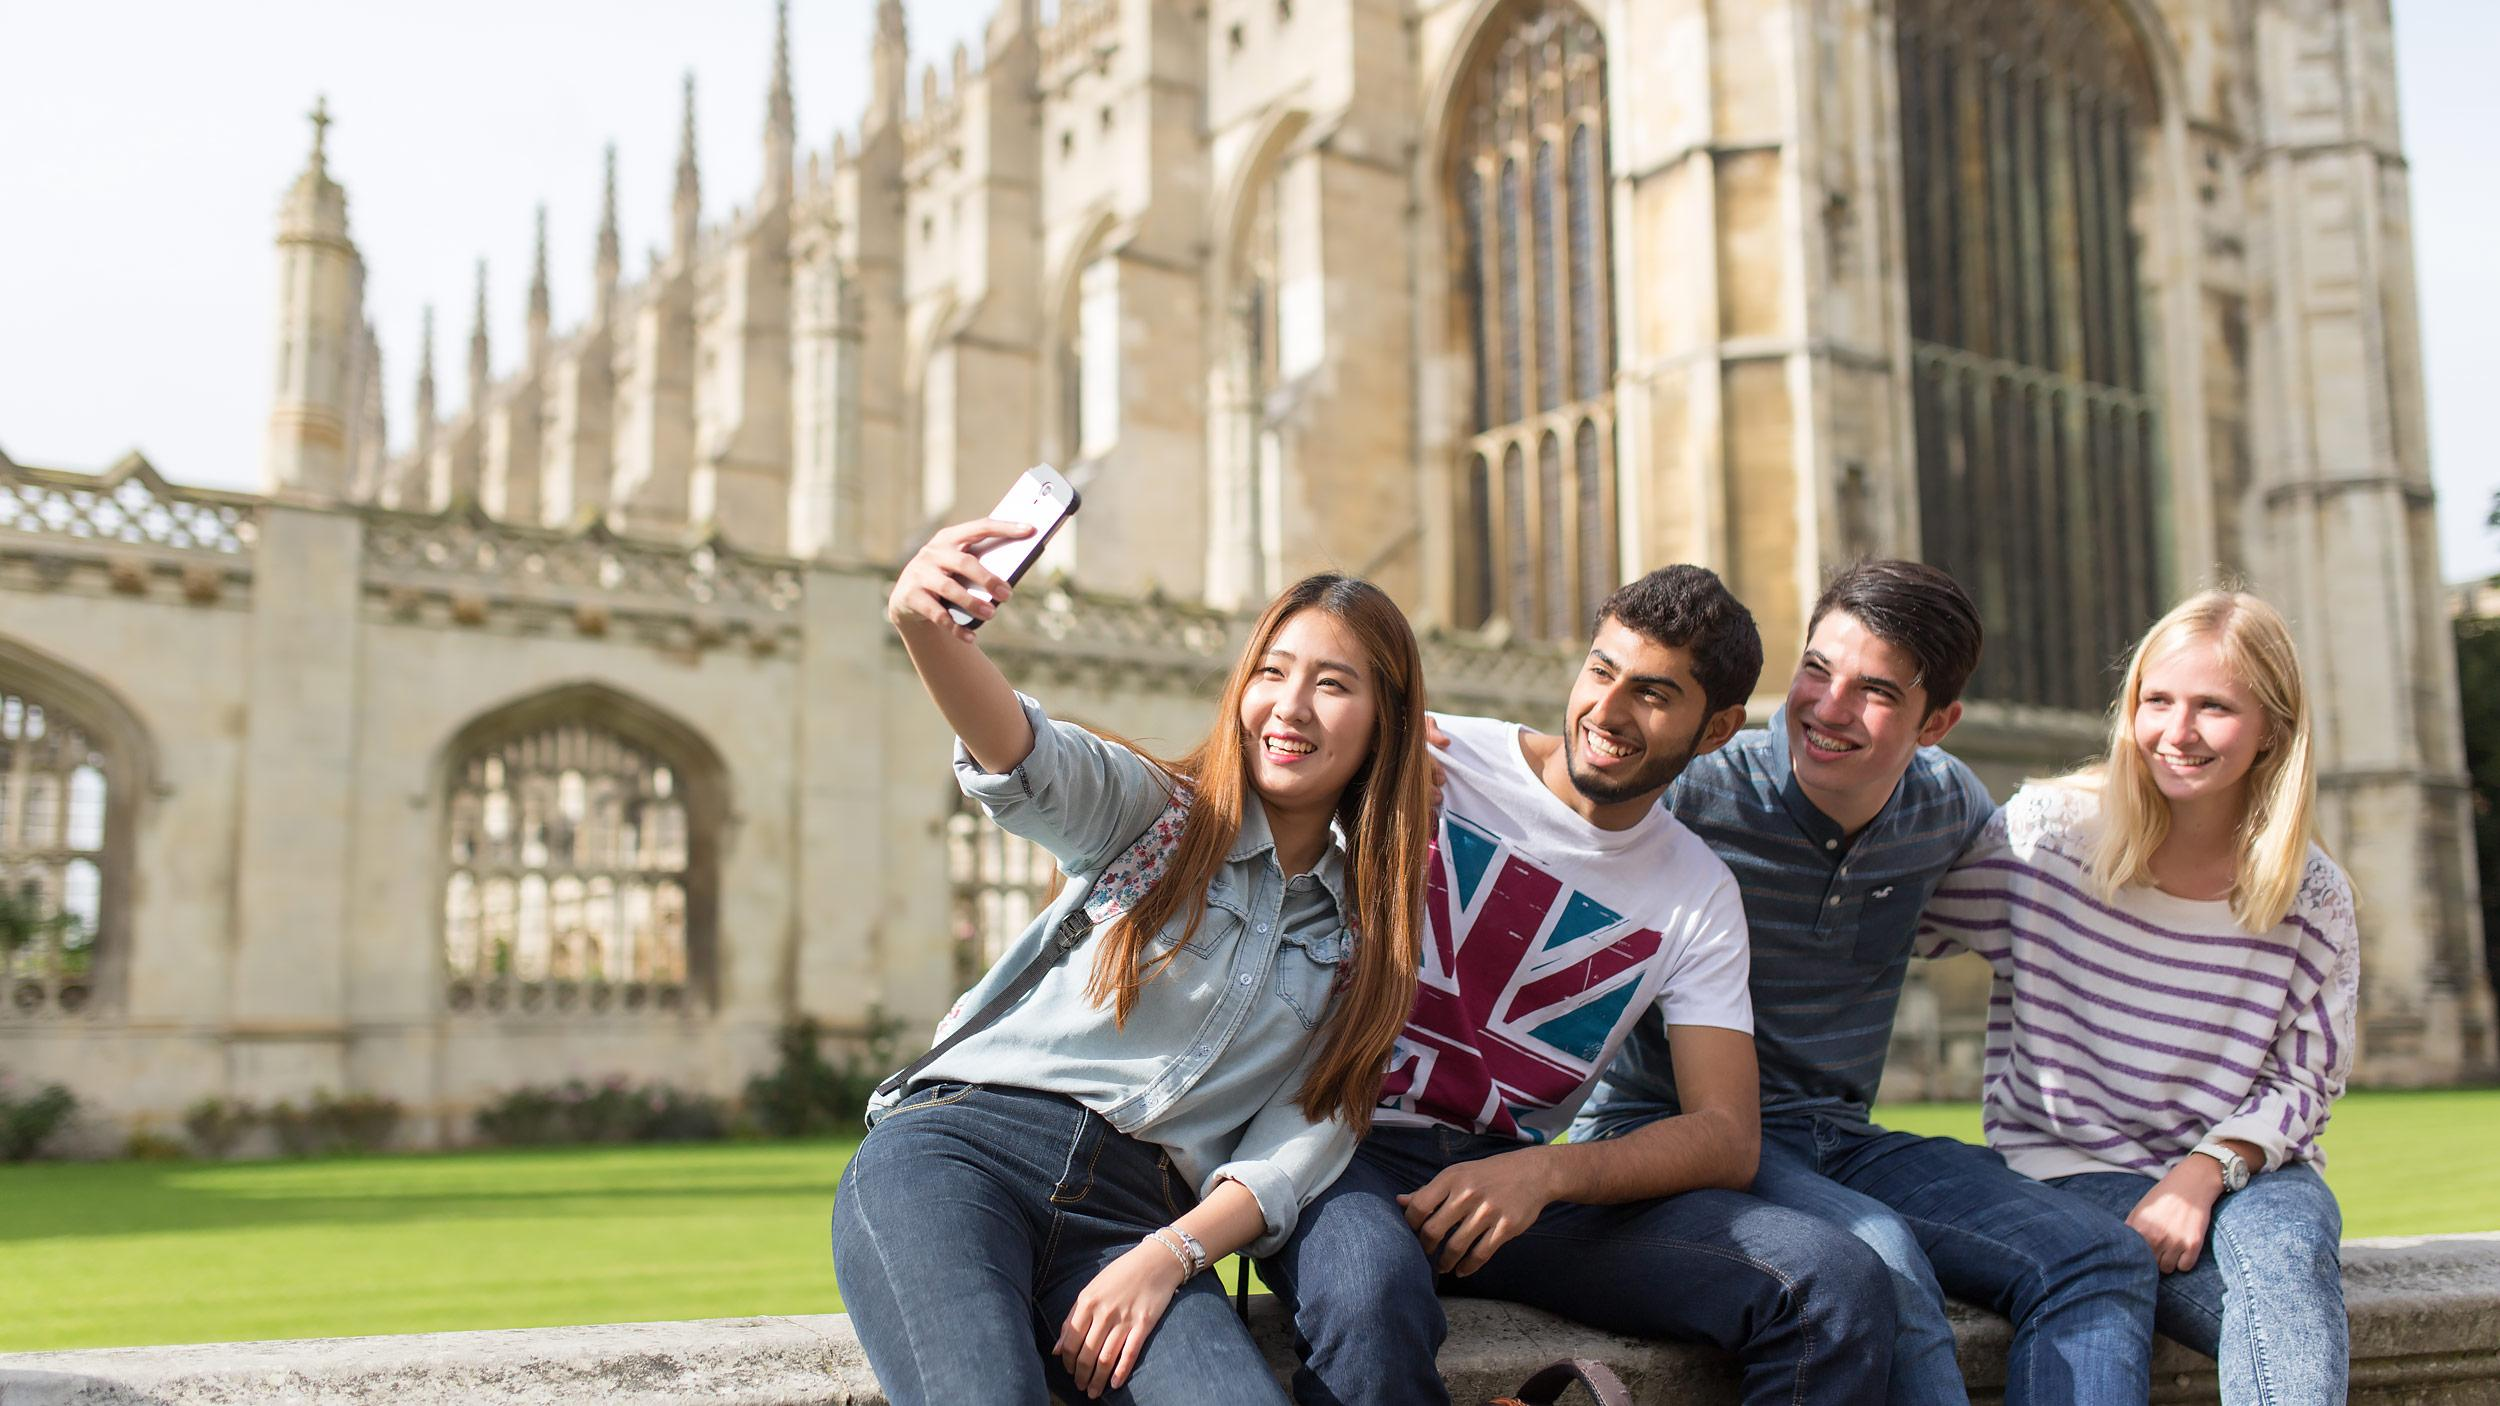 Kaplan International Colleges - Undergraduate pathways в Великобритании